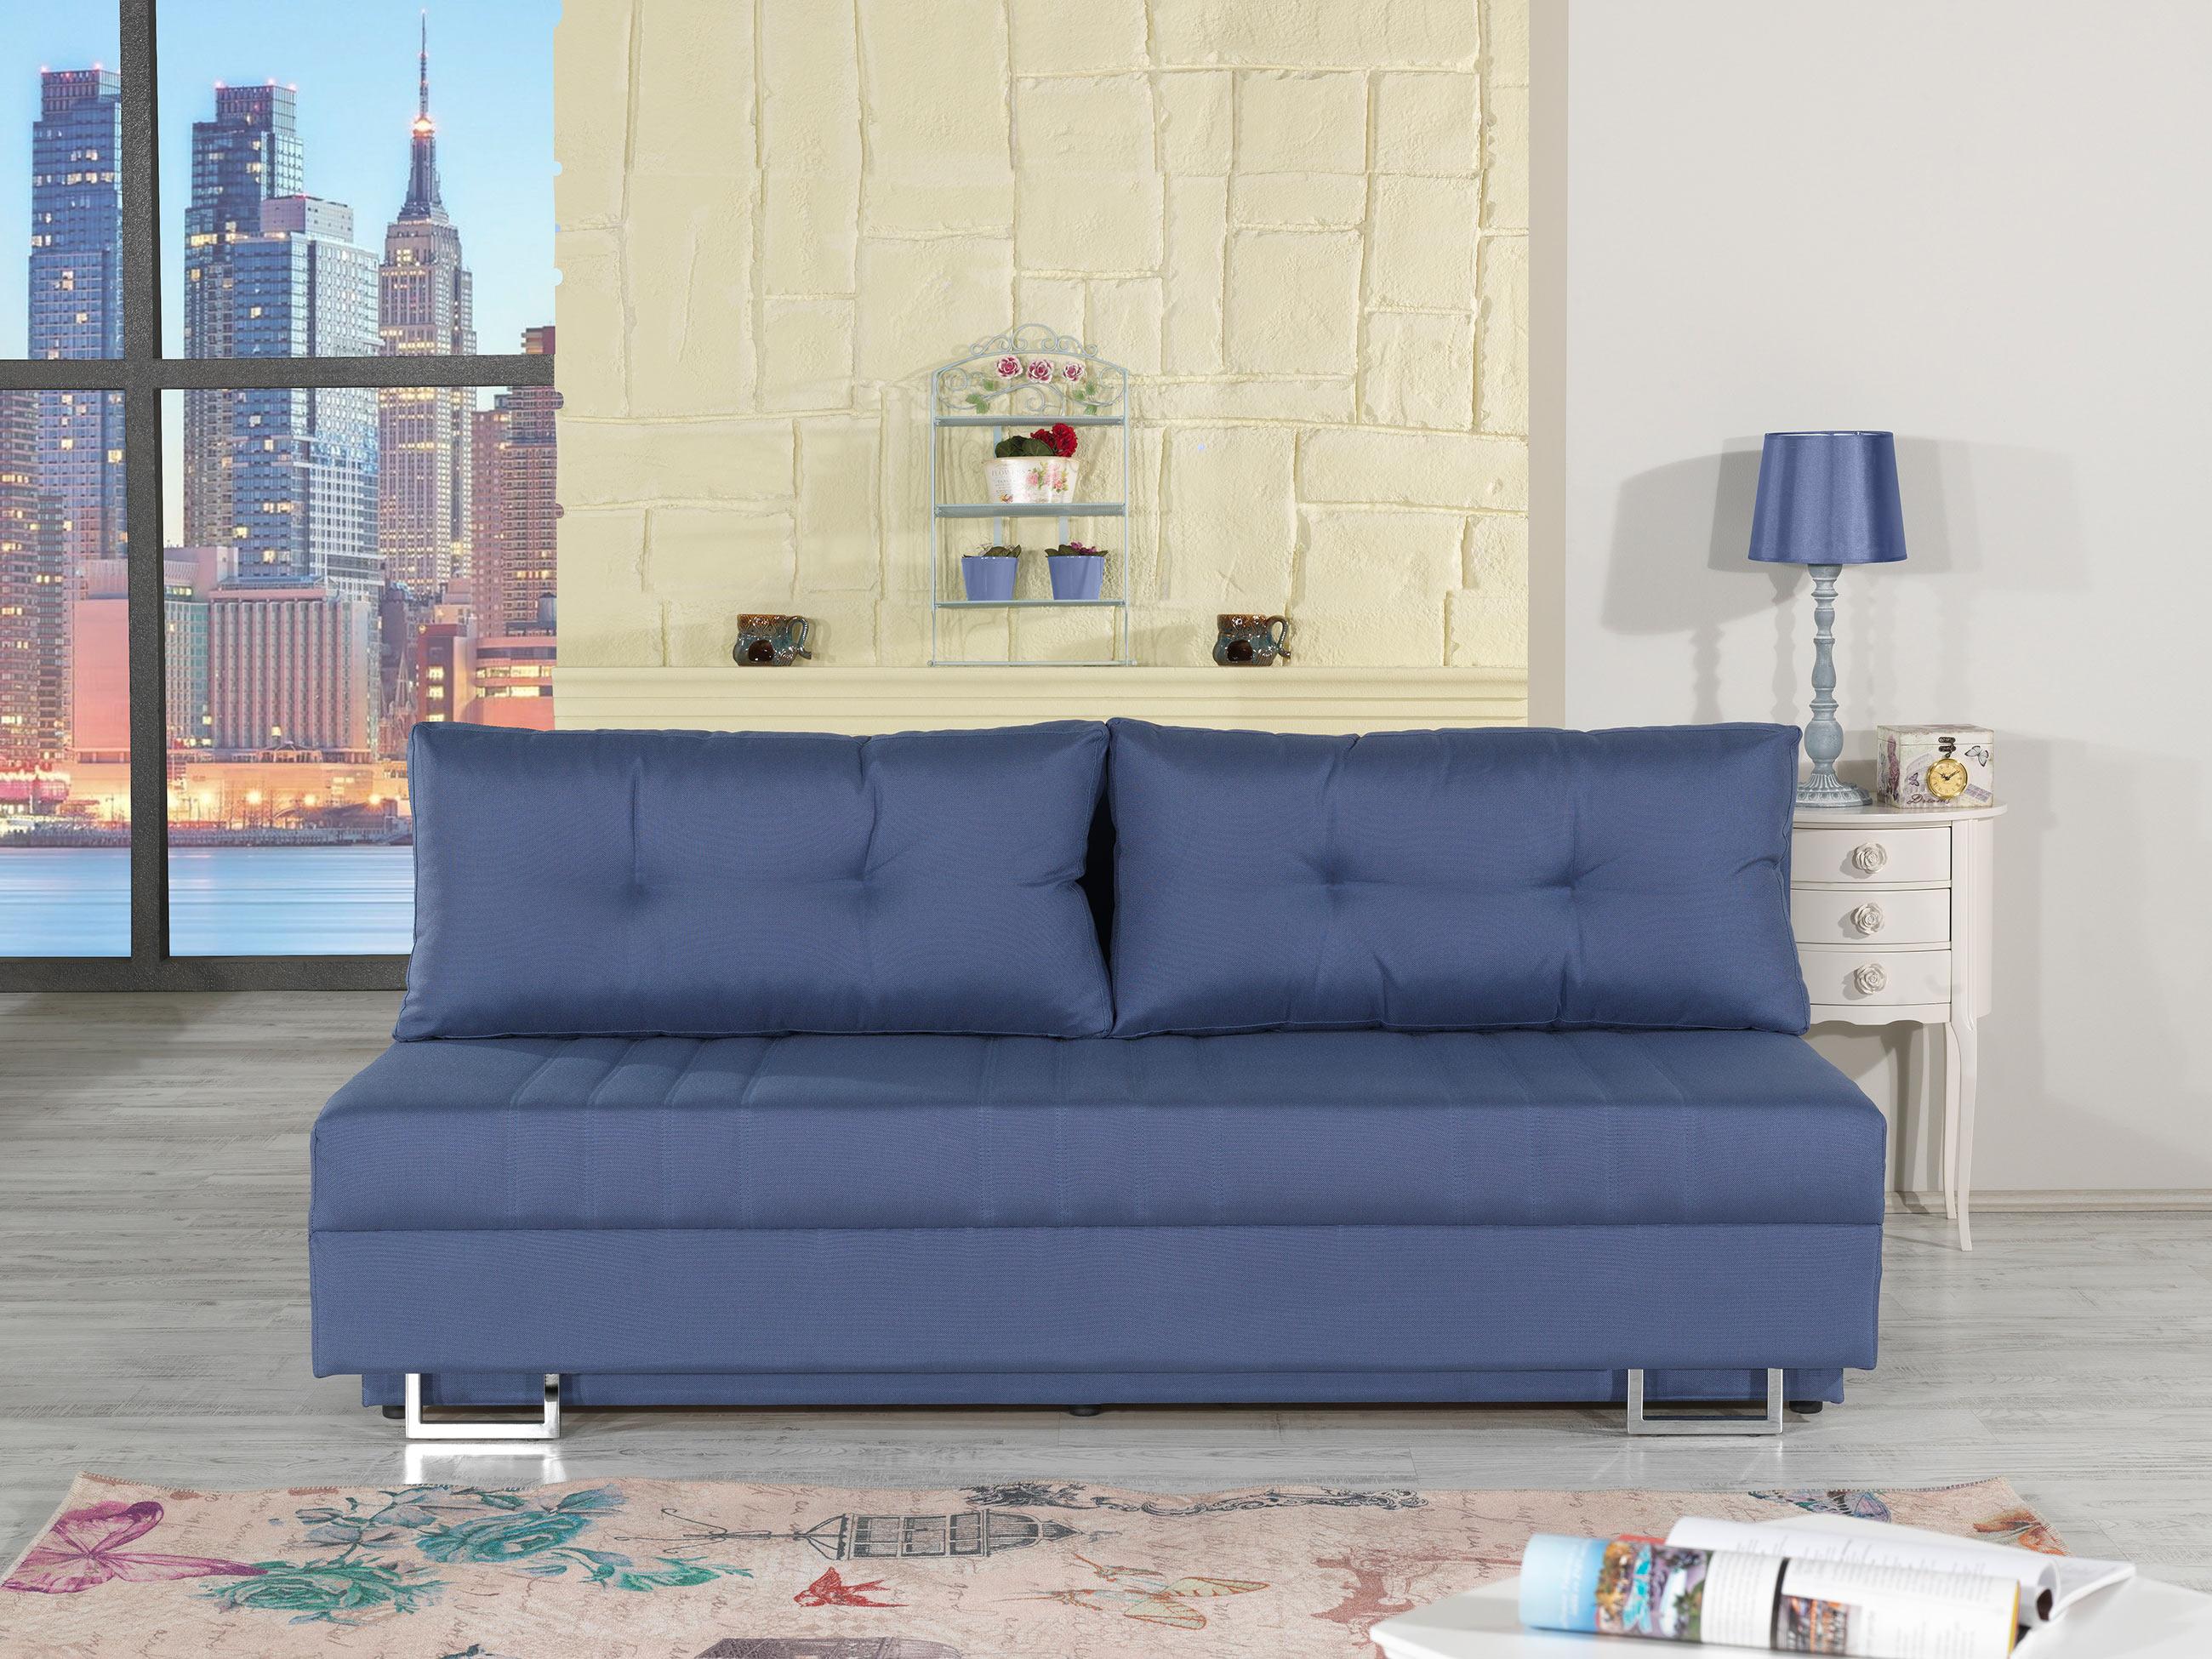 Flex Motion Blue Queen Sofa Bed w Storage by Casamode